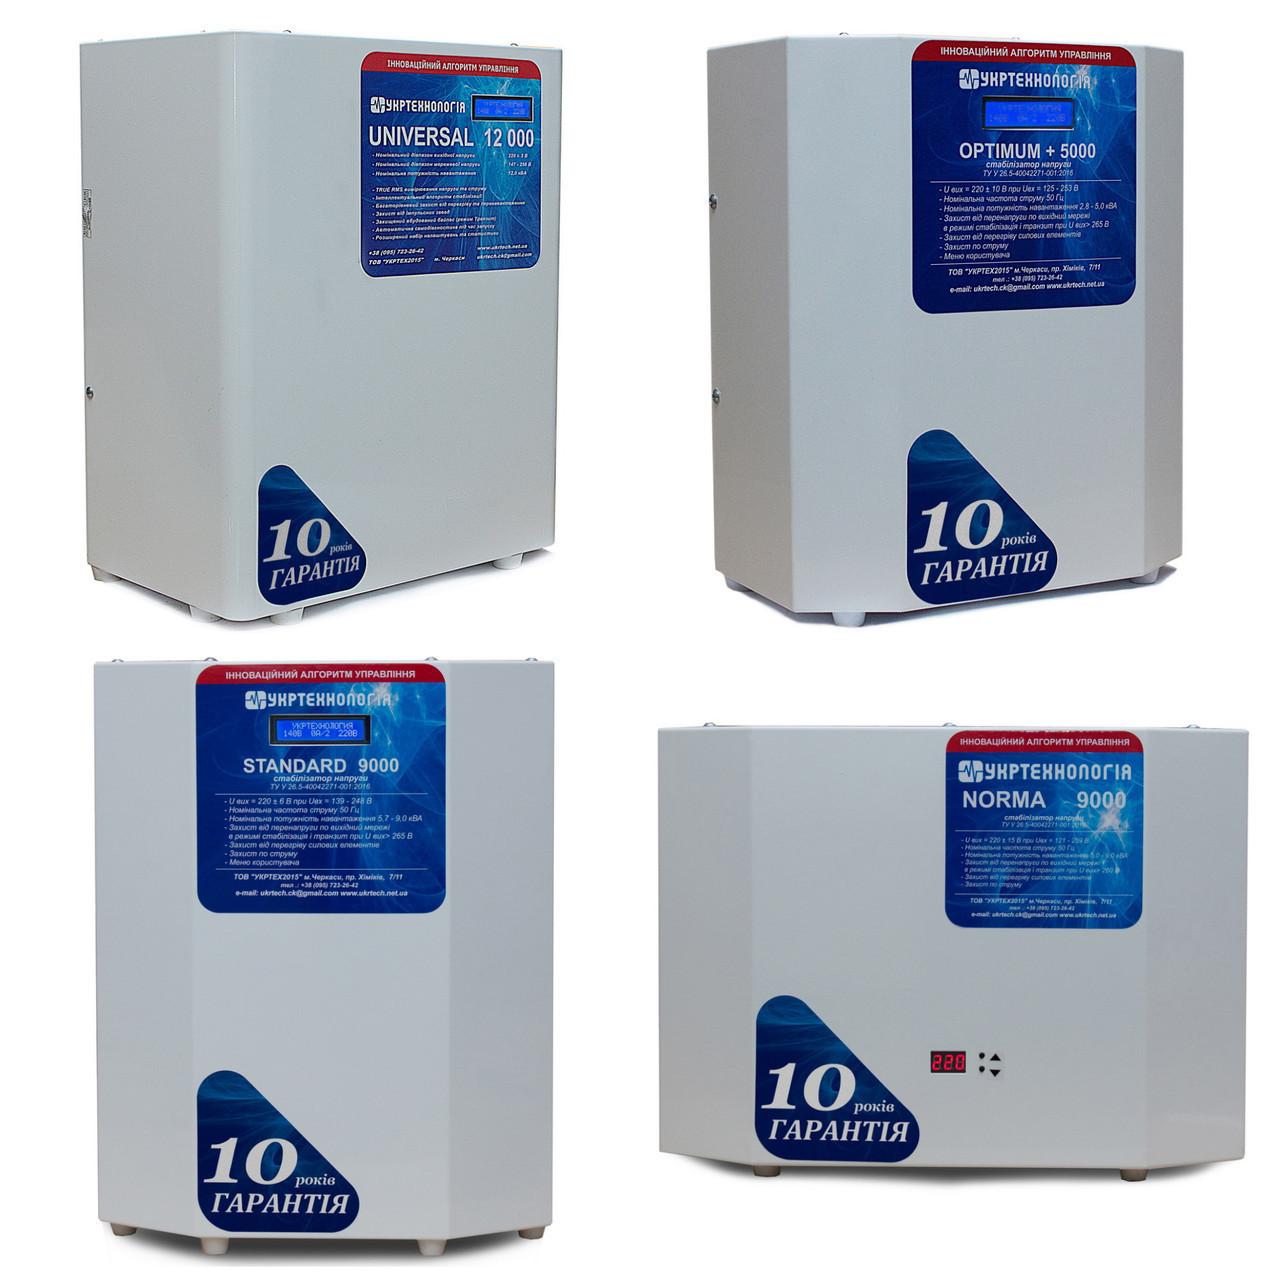 Стабилизатор напряжения Укртехнология НСН 9000 Optimum HV 9,0 кВт